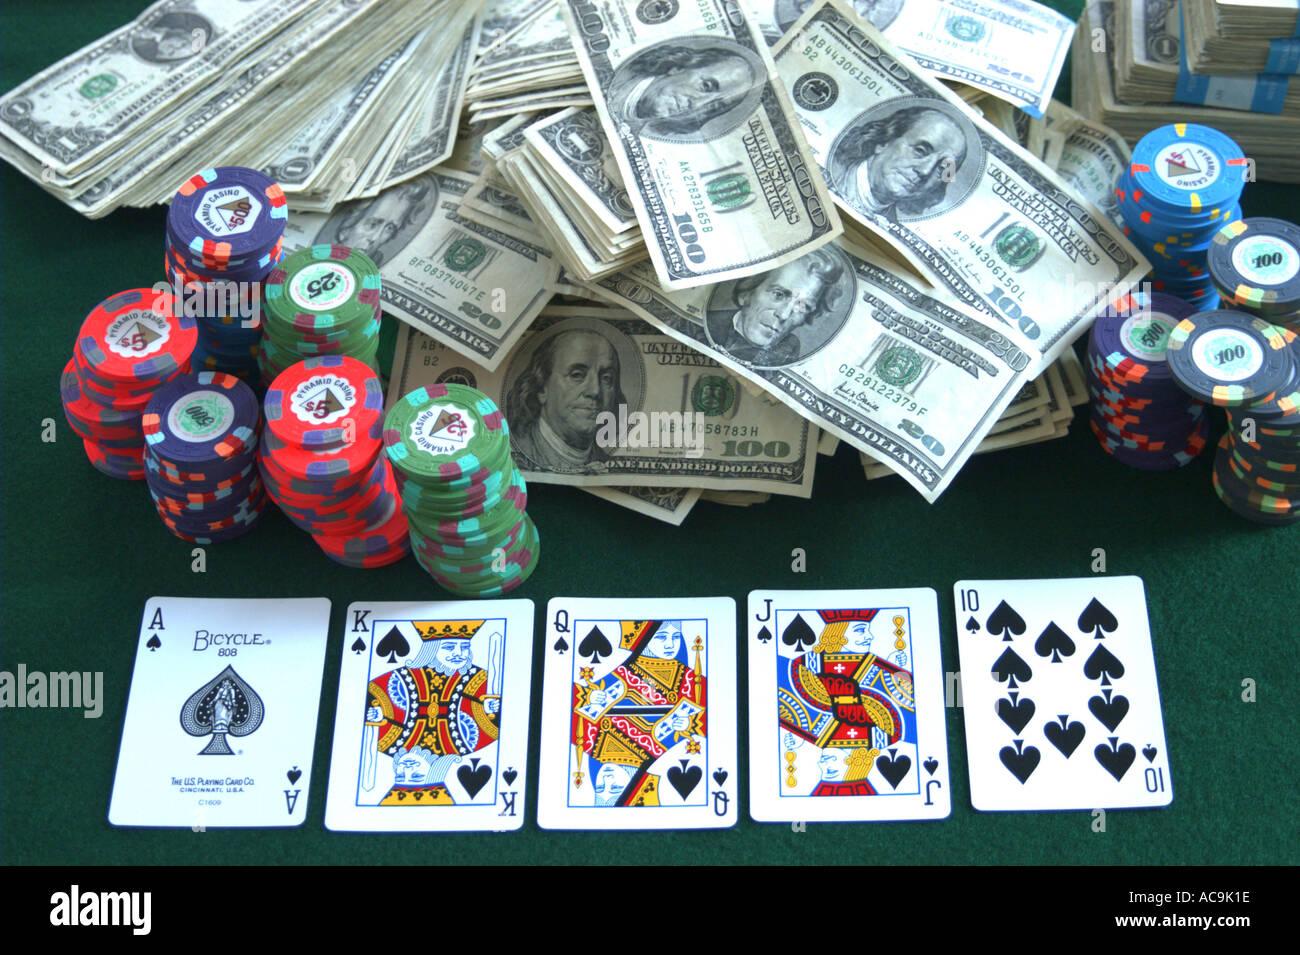 Gamblers Gaming Table Chips Dollars Stake Stock Photos